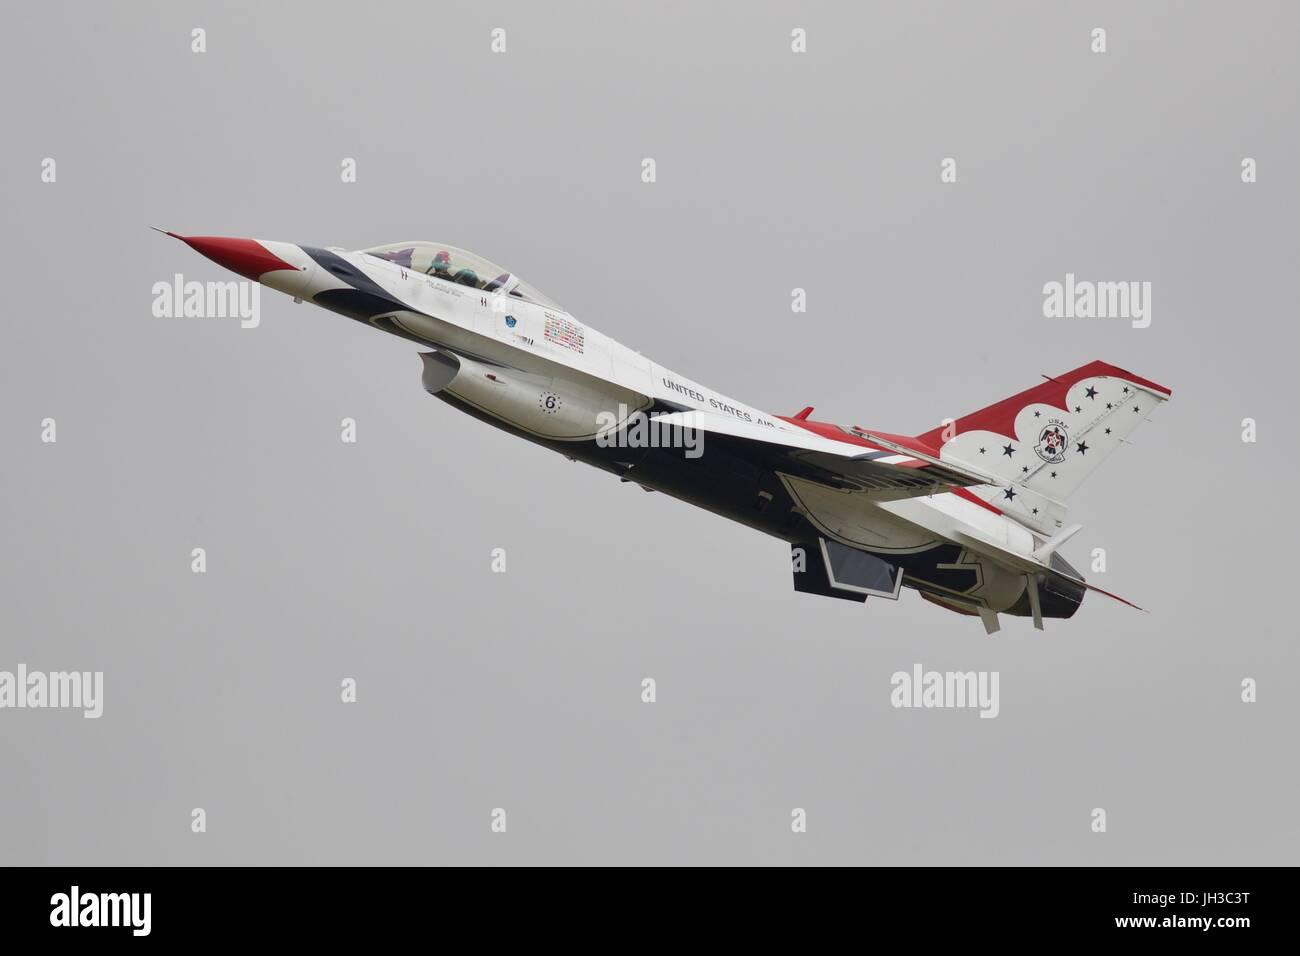 F-16 Fighting Falcon form the USAF Thunderbirds aerobatic team - Stock Image